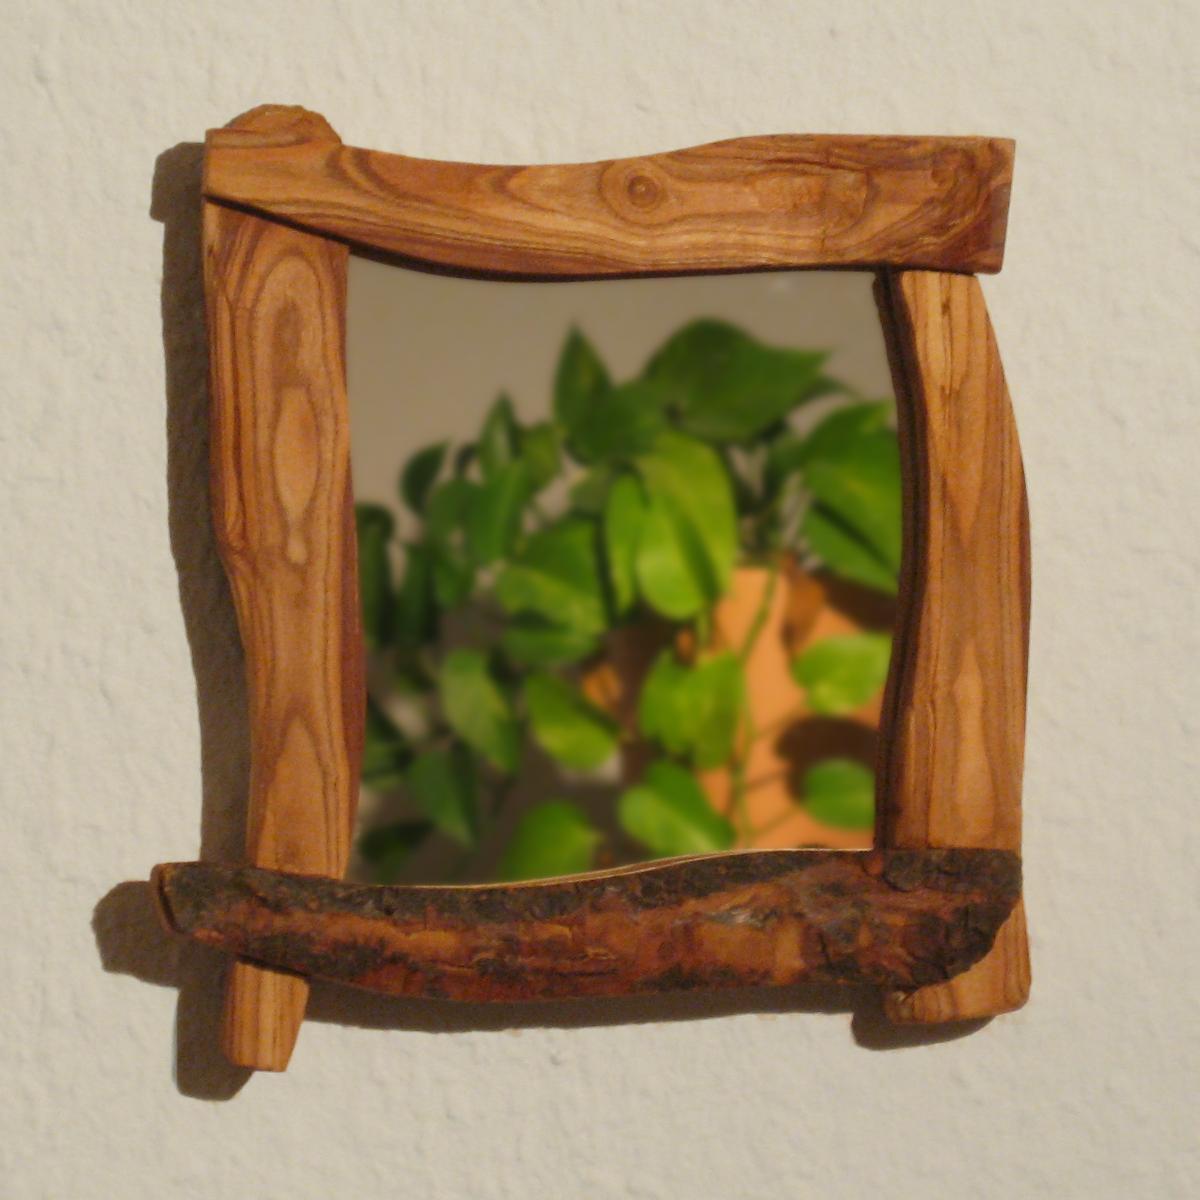 selbstgebauter Spiegel